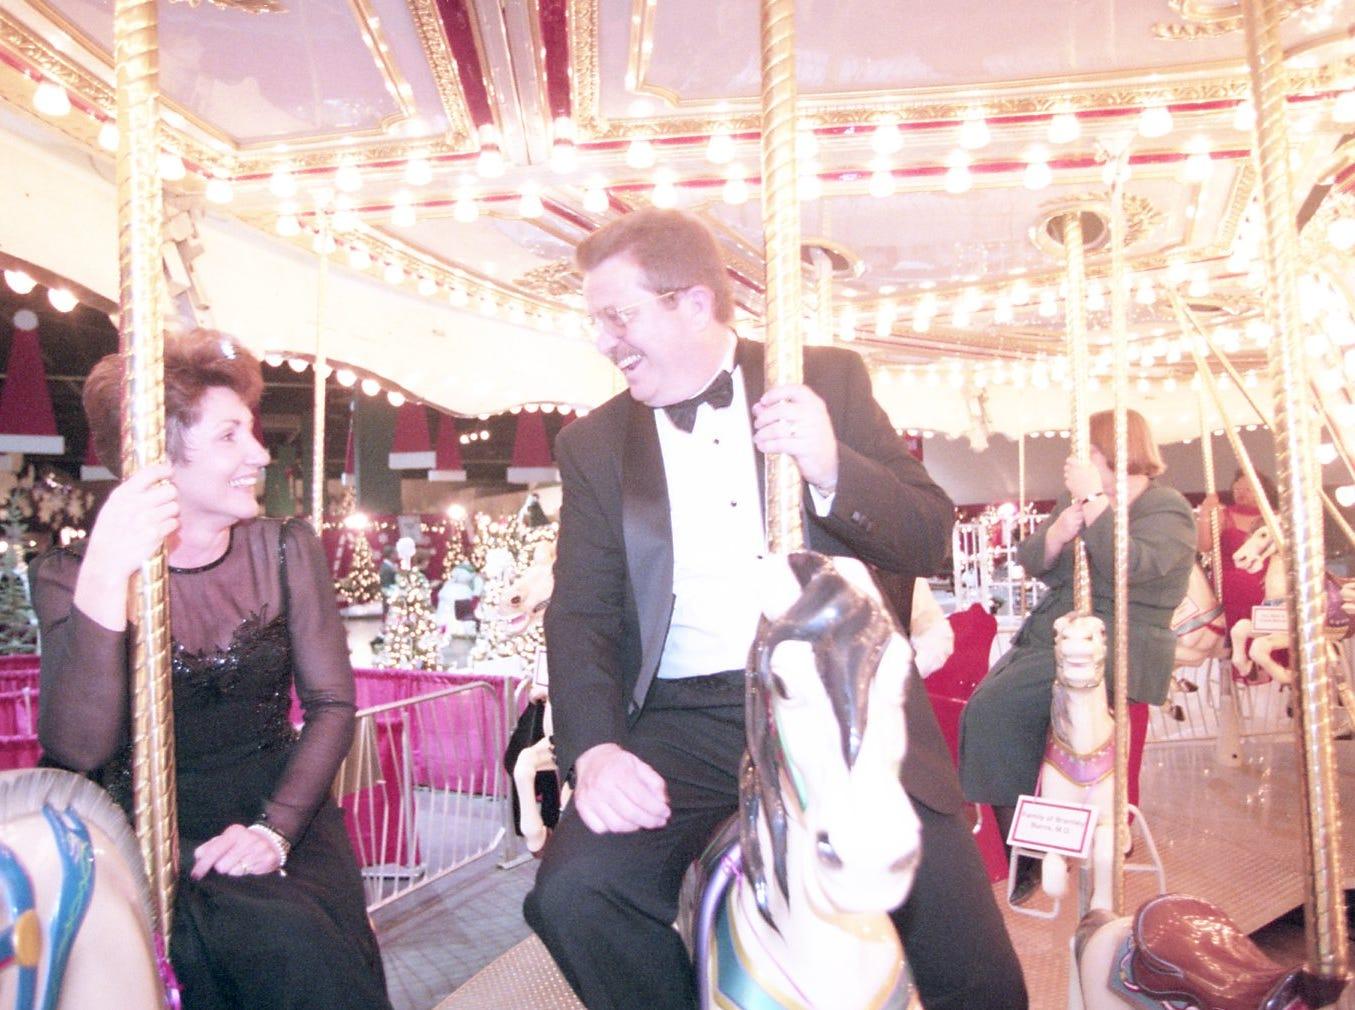 Sandy McKelvy and Cleston Jones ride the merry-go-round at Fantasy of Trees, November, 1997.